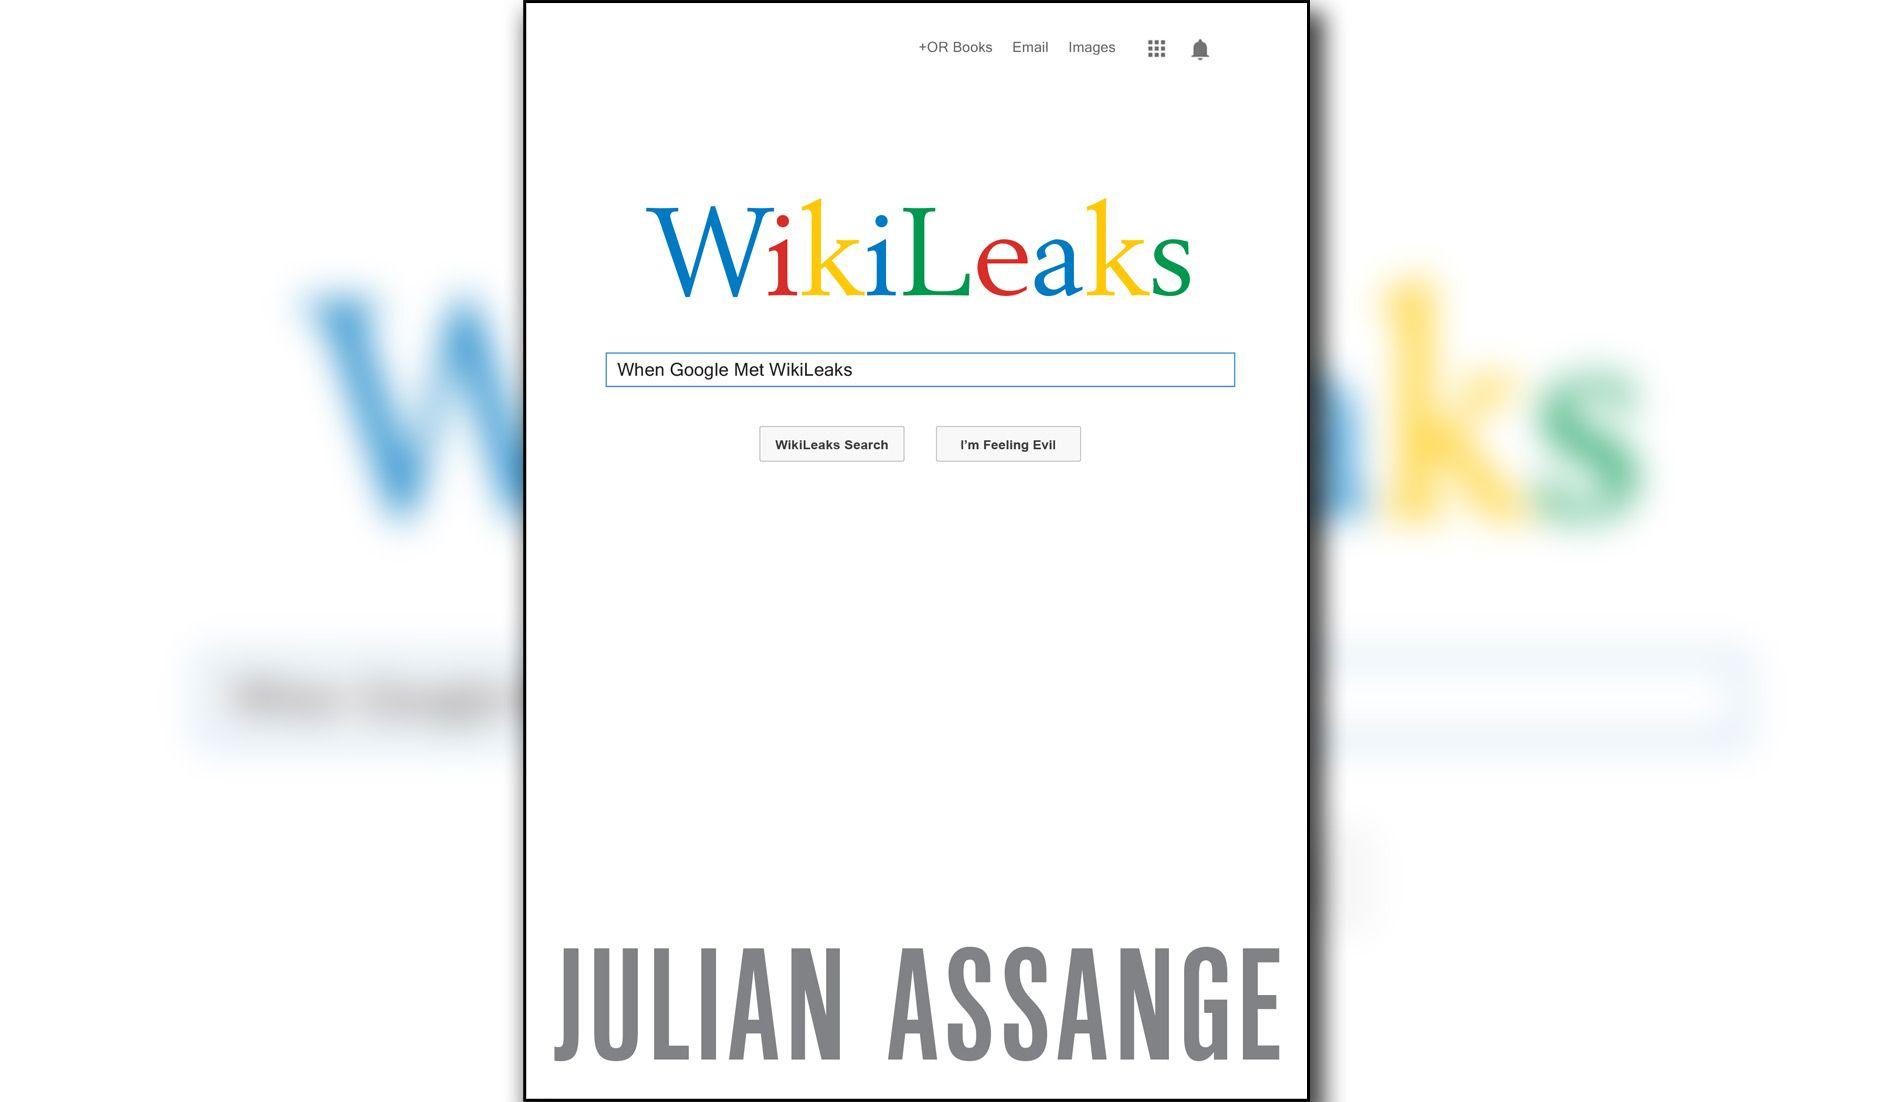 12_23_Assange